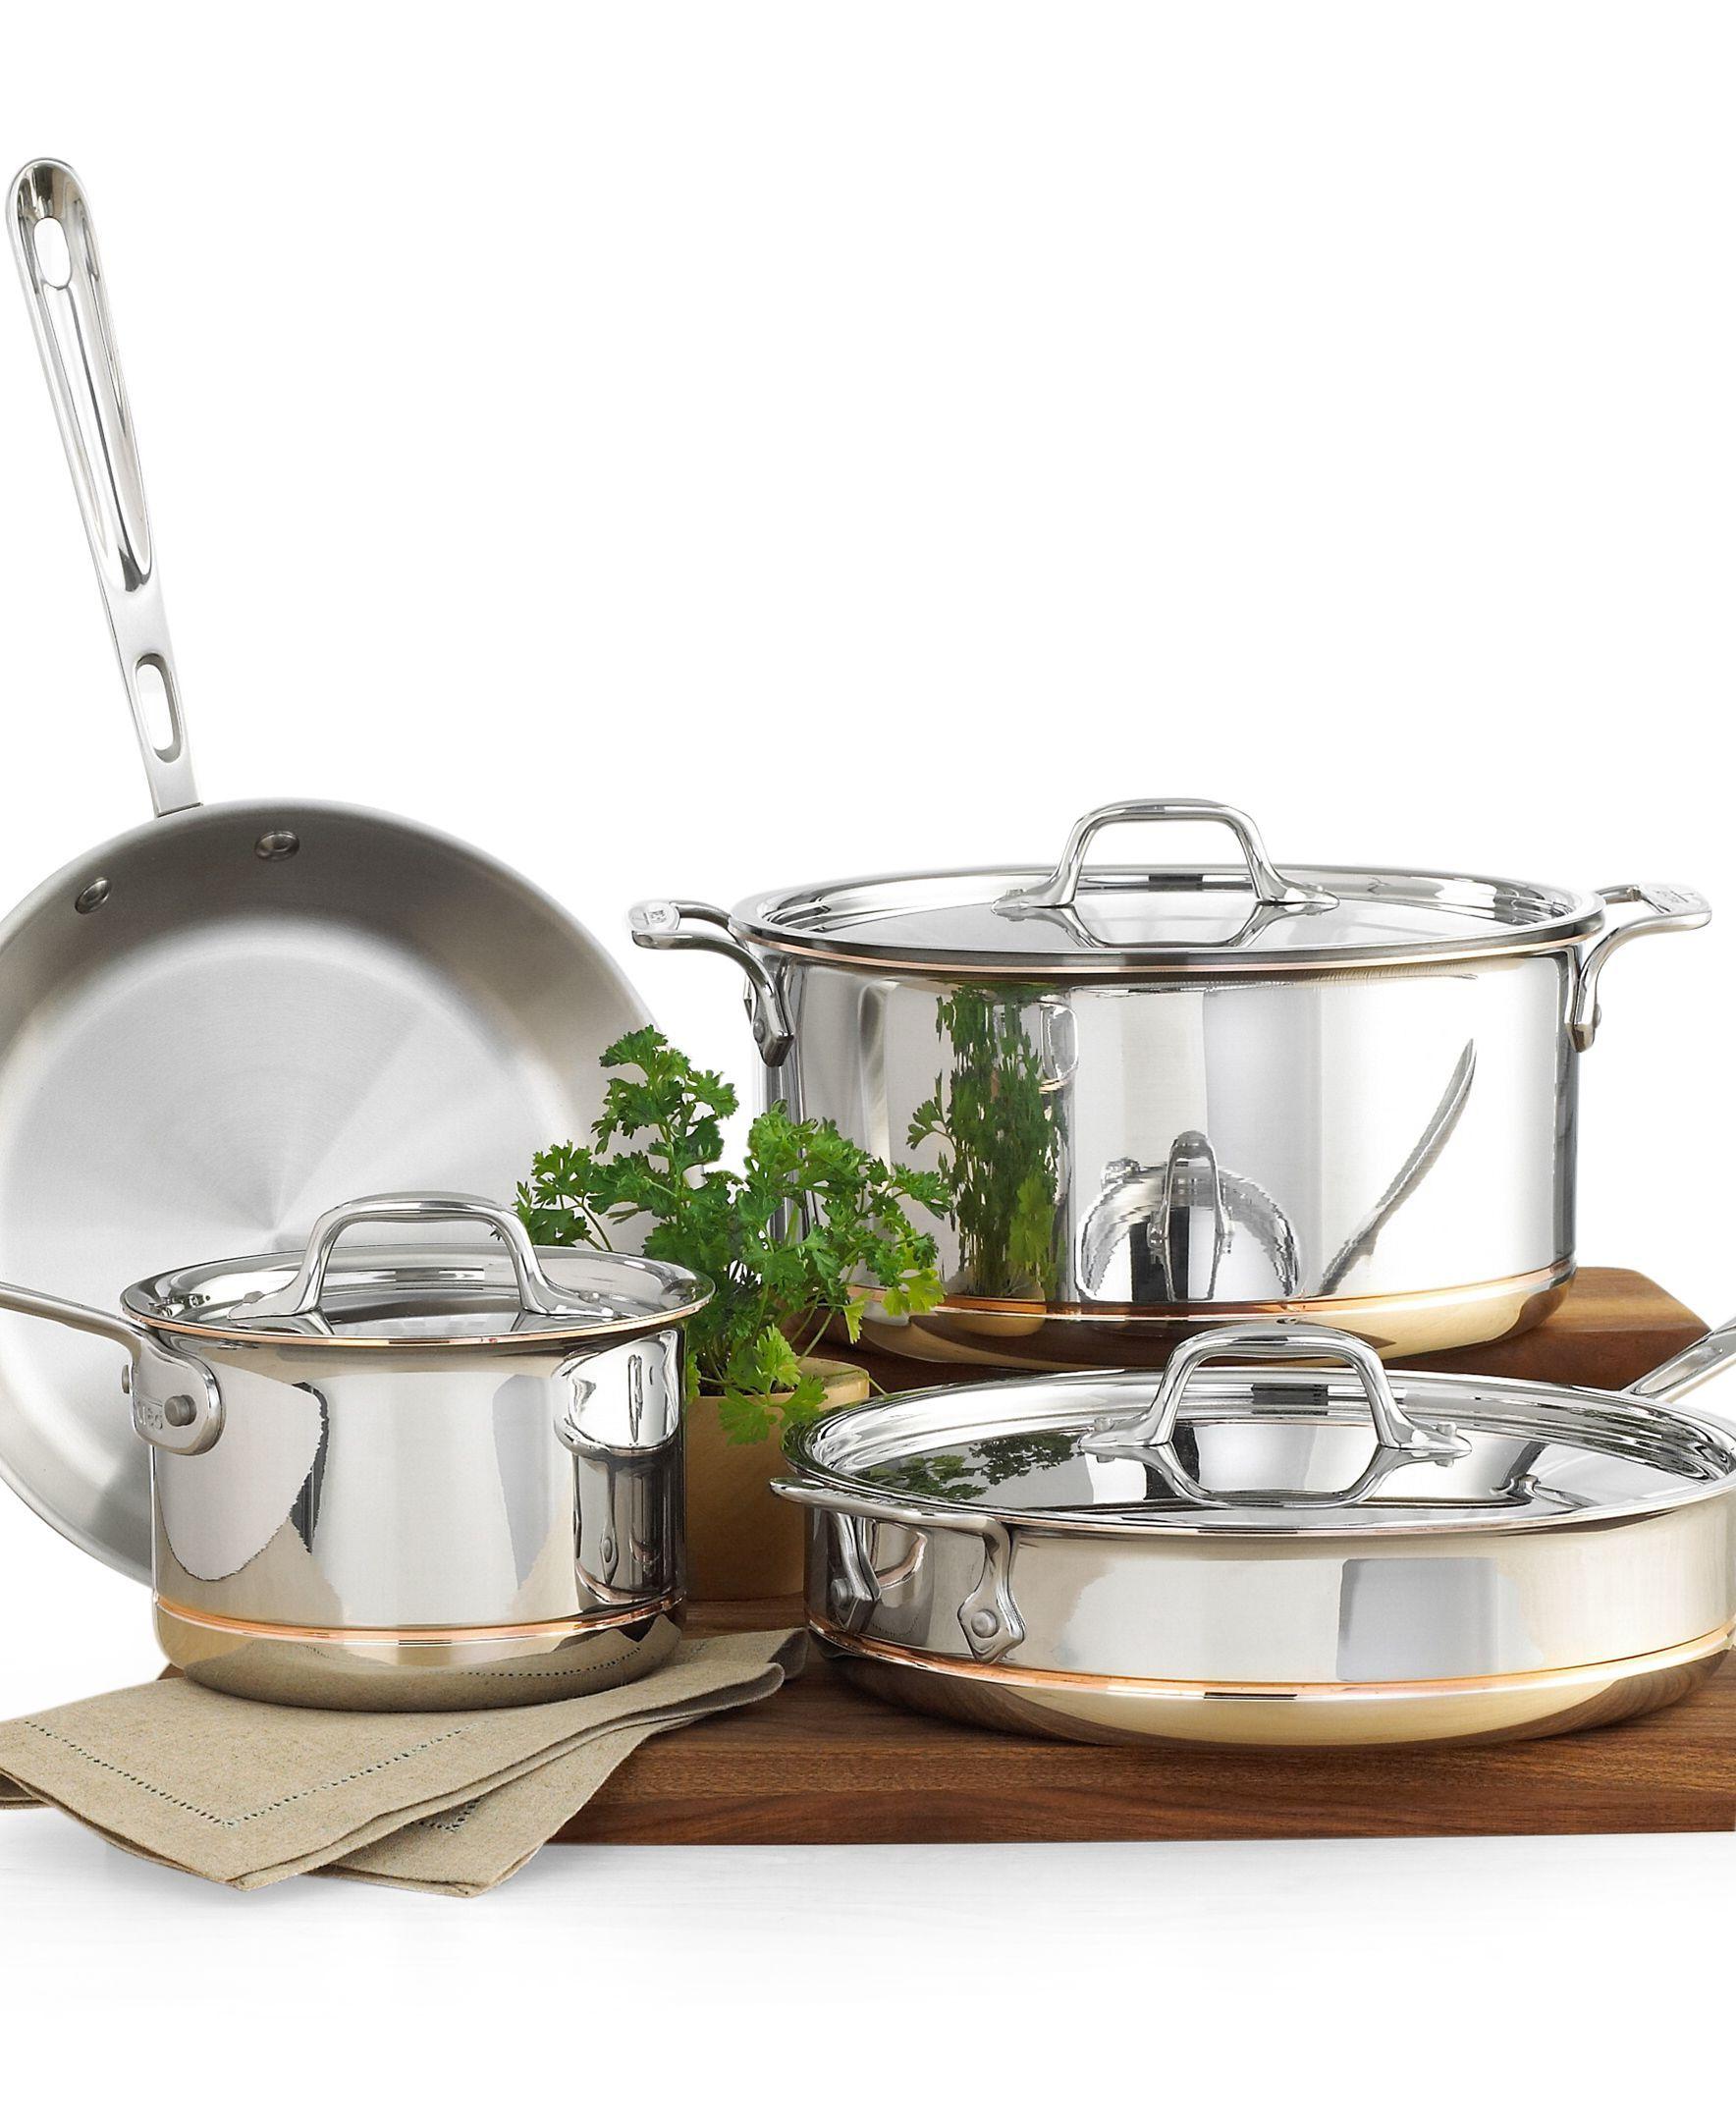 All Clad Copper Core 7 Piece Cookware Set Reviews Cookware Sets Macy S Cookware Set Cookware Sets Kitchen Cookware All clad 7 piece set